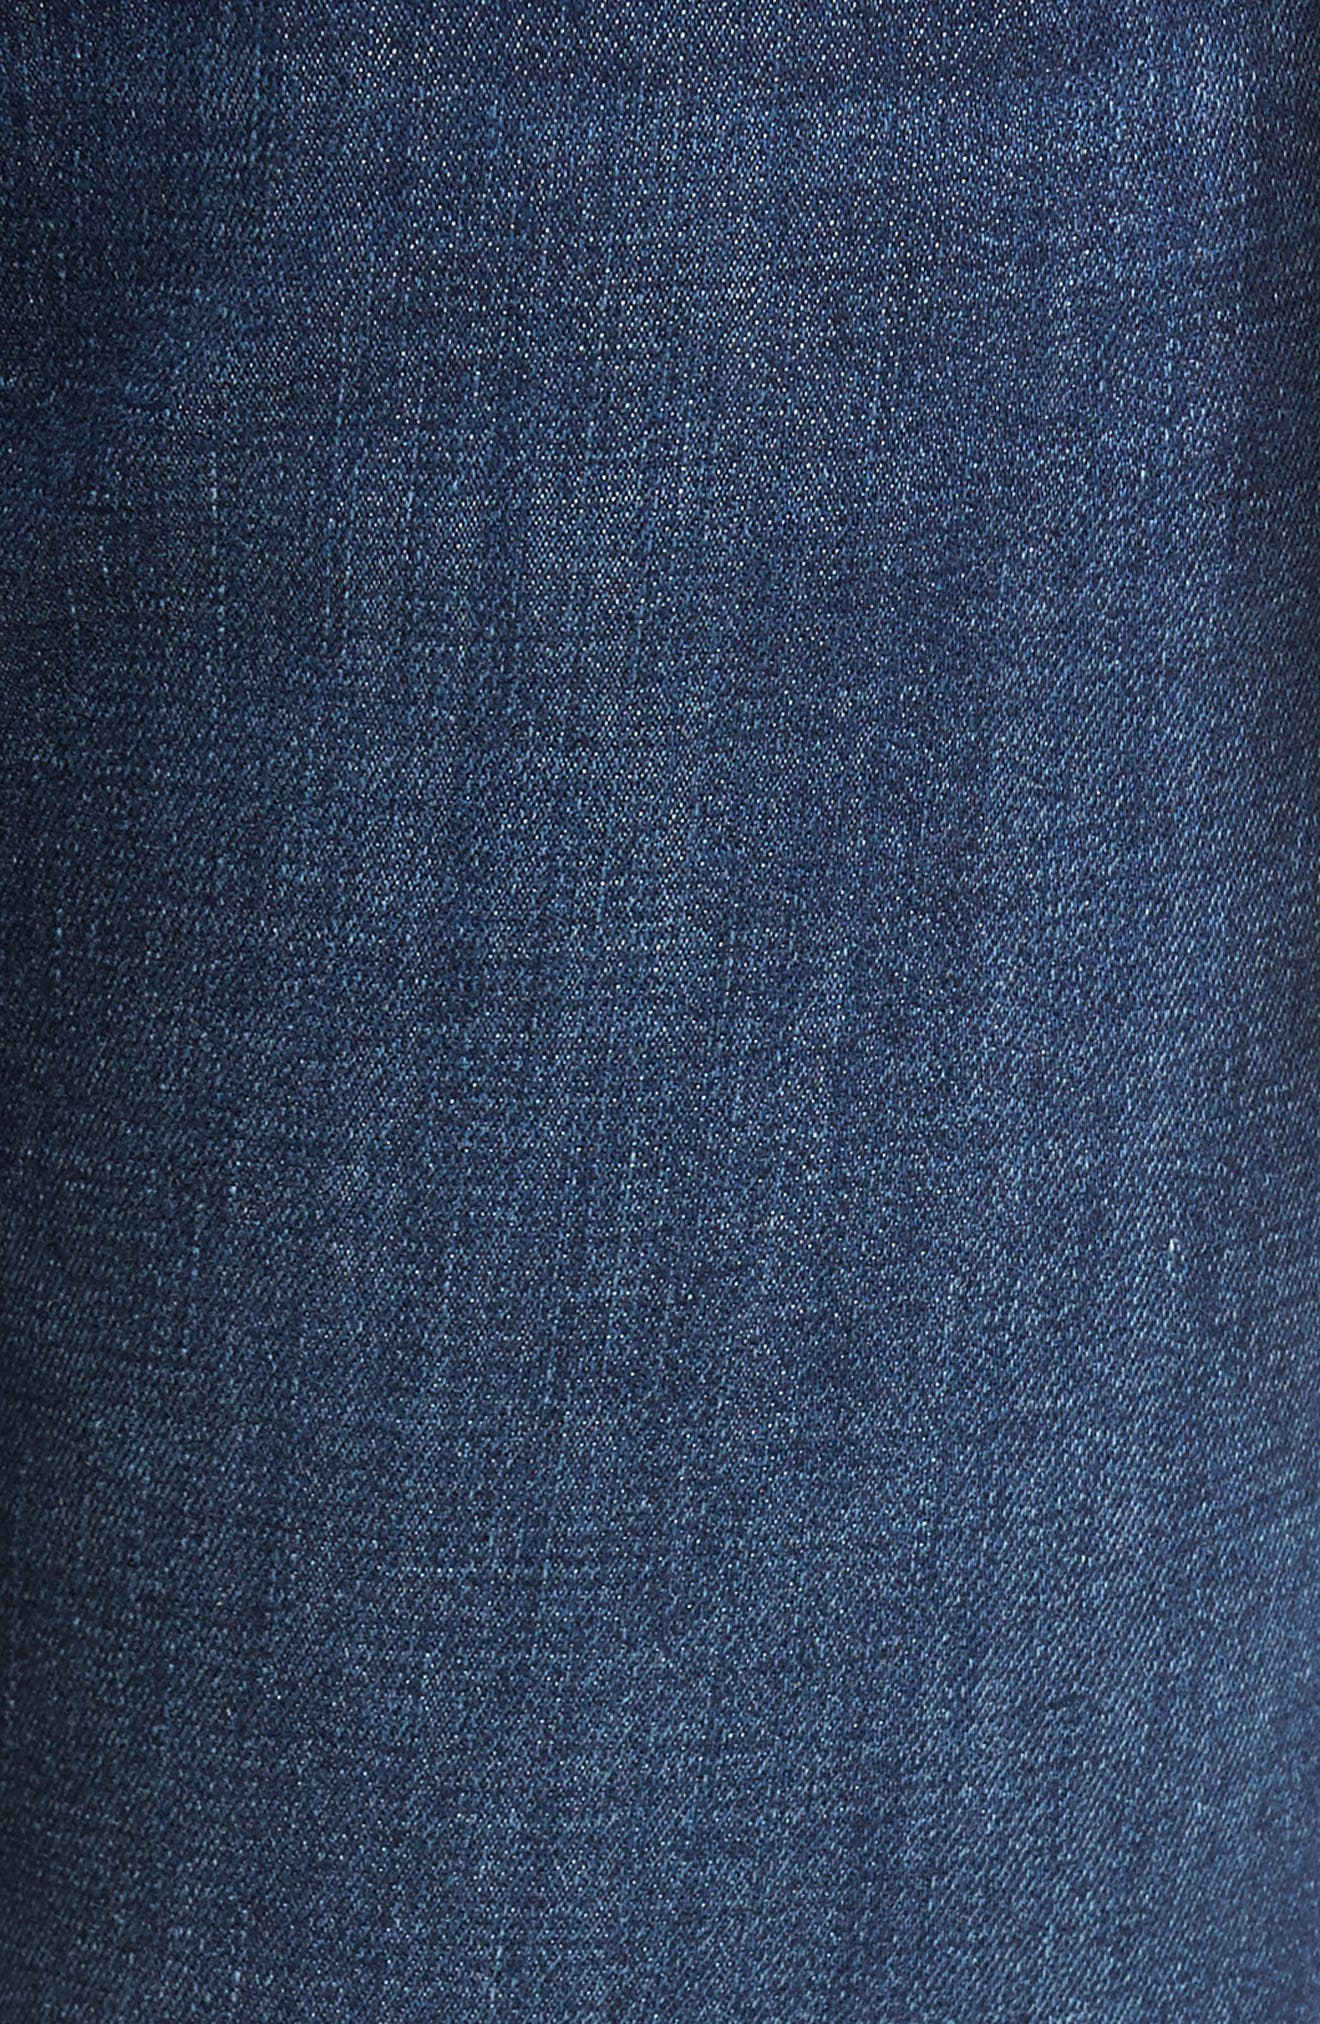 Marcus Slim Straight Leg Jeans,                             Alternate thumbnail 5, color,                             INDIGO PORTLAND